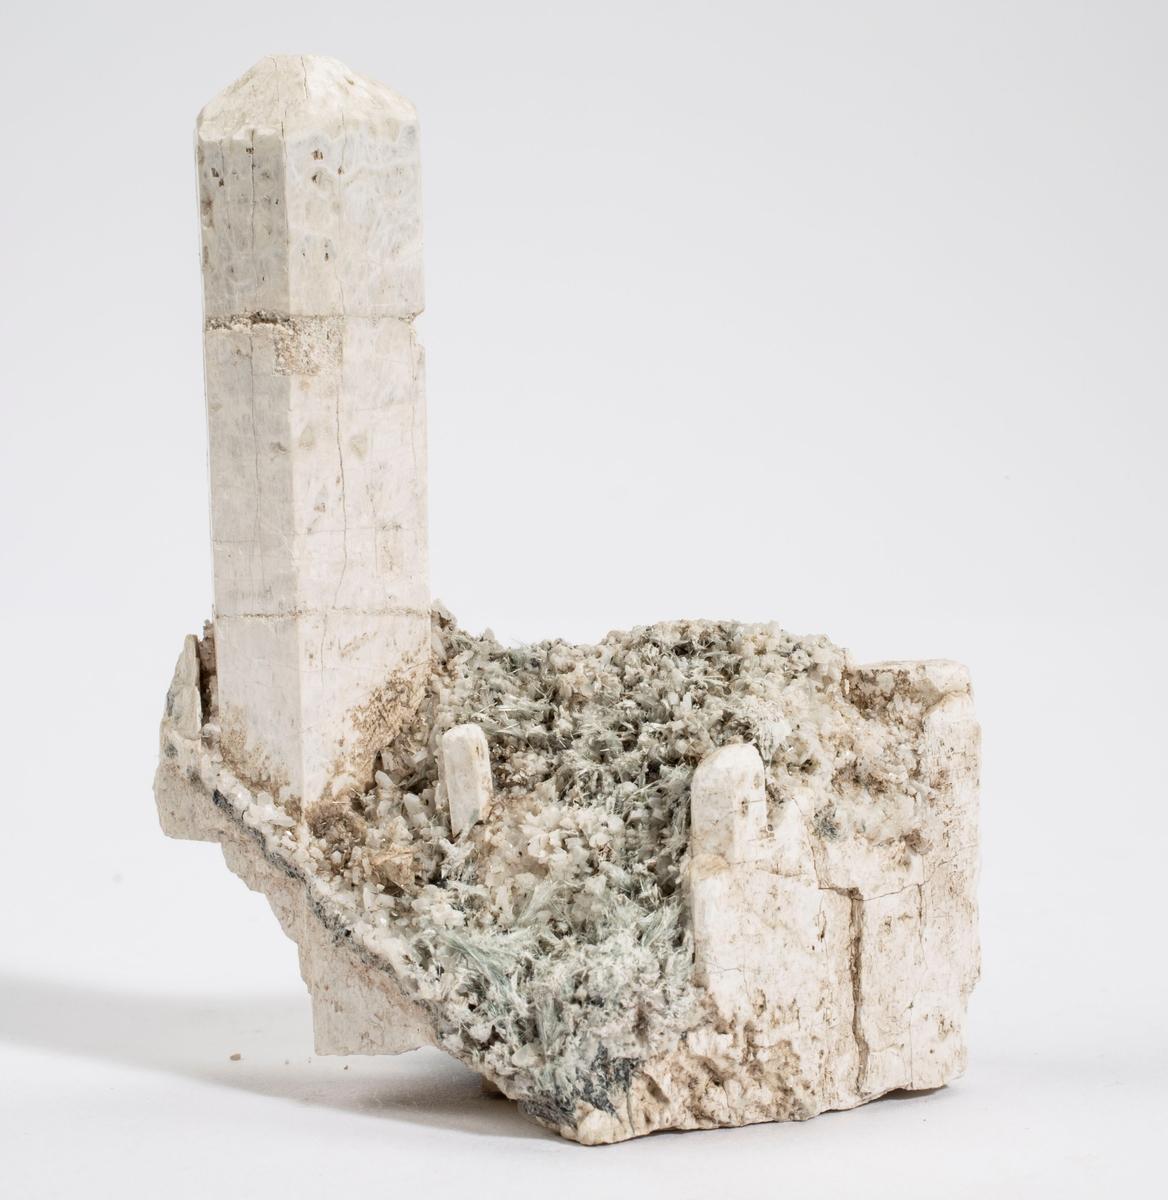 Hvit apatitt (CaOH?) krystall på matriks (reparert) av apatitt, albitt? (mikrokryst. hvite) og aktinolittasbest. Diopsidforekomst.